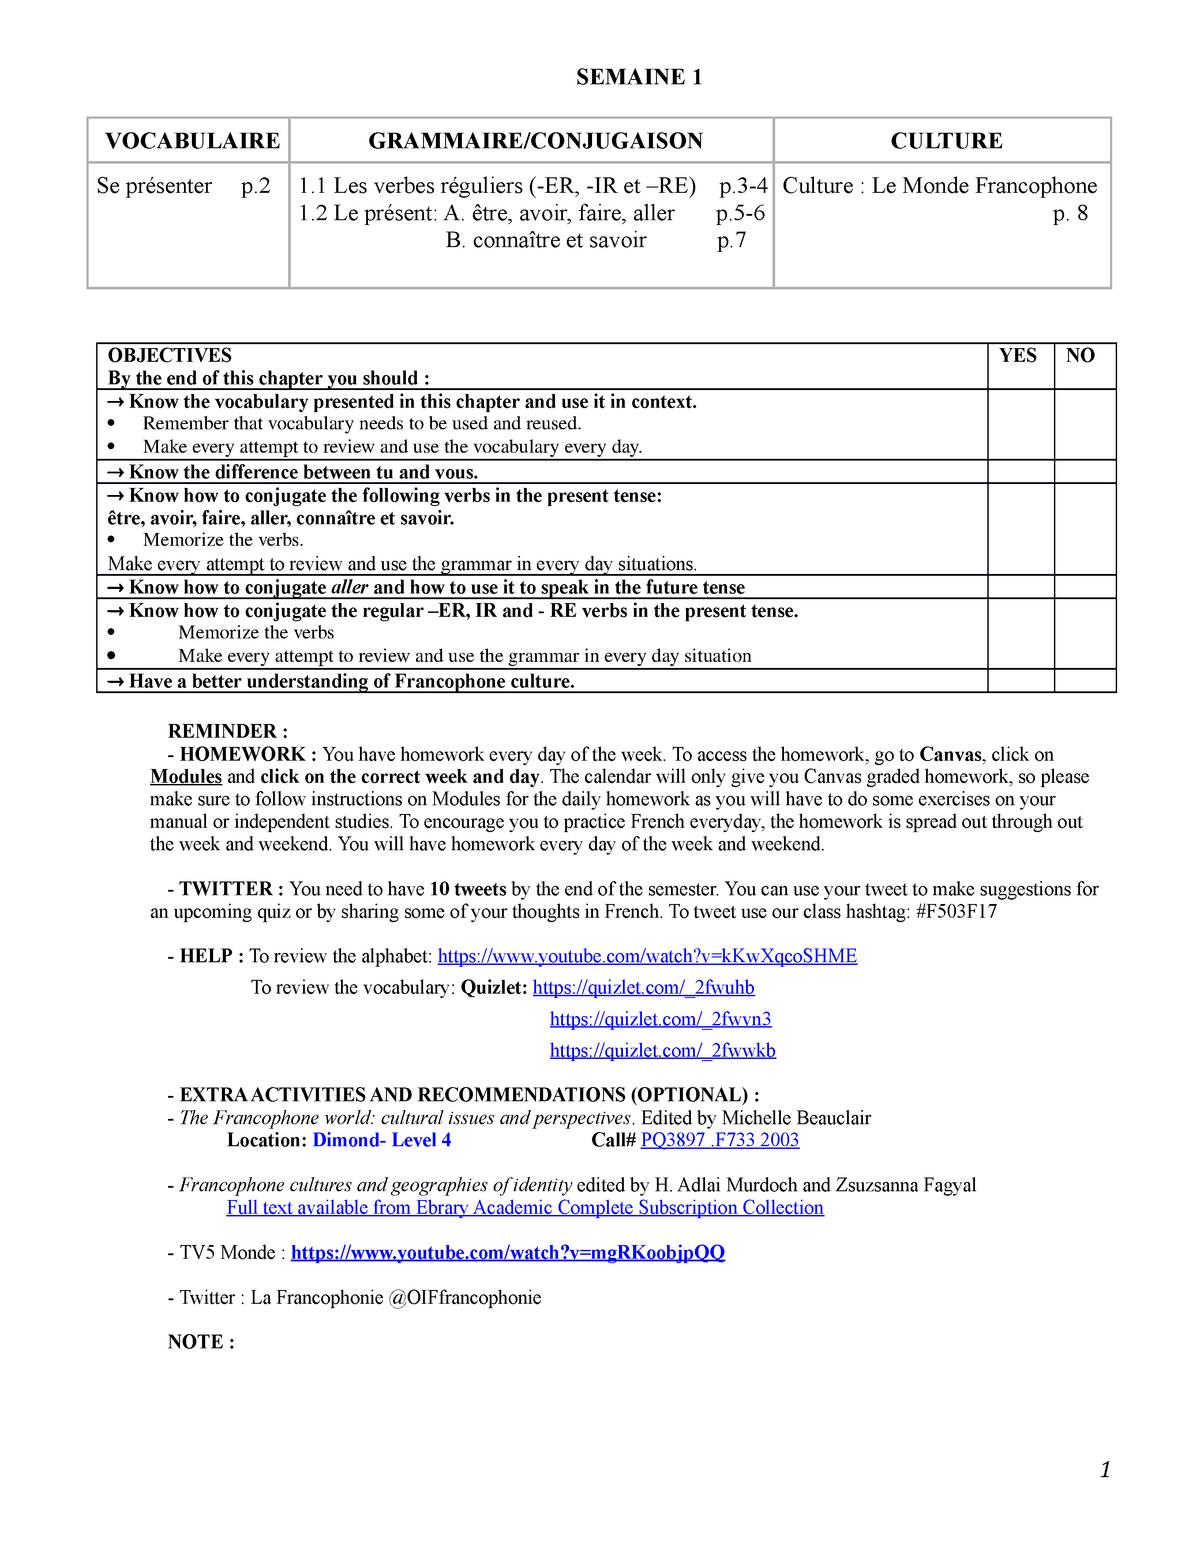 Week 1 French - FREN 503: Intermediate French - StuDocu